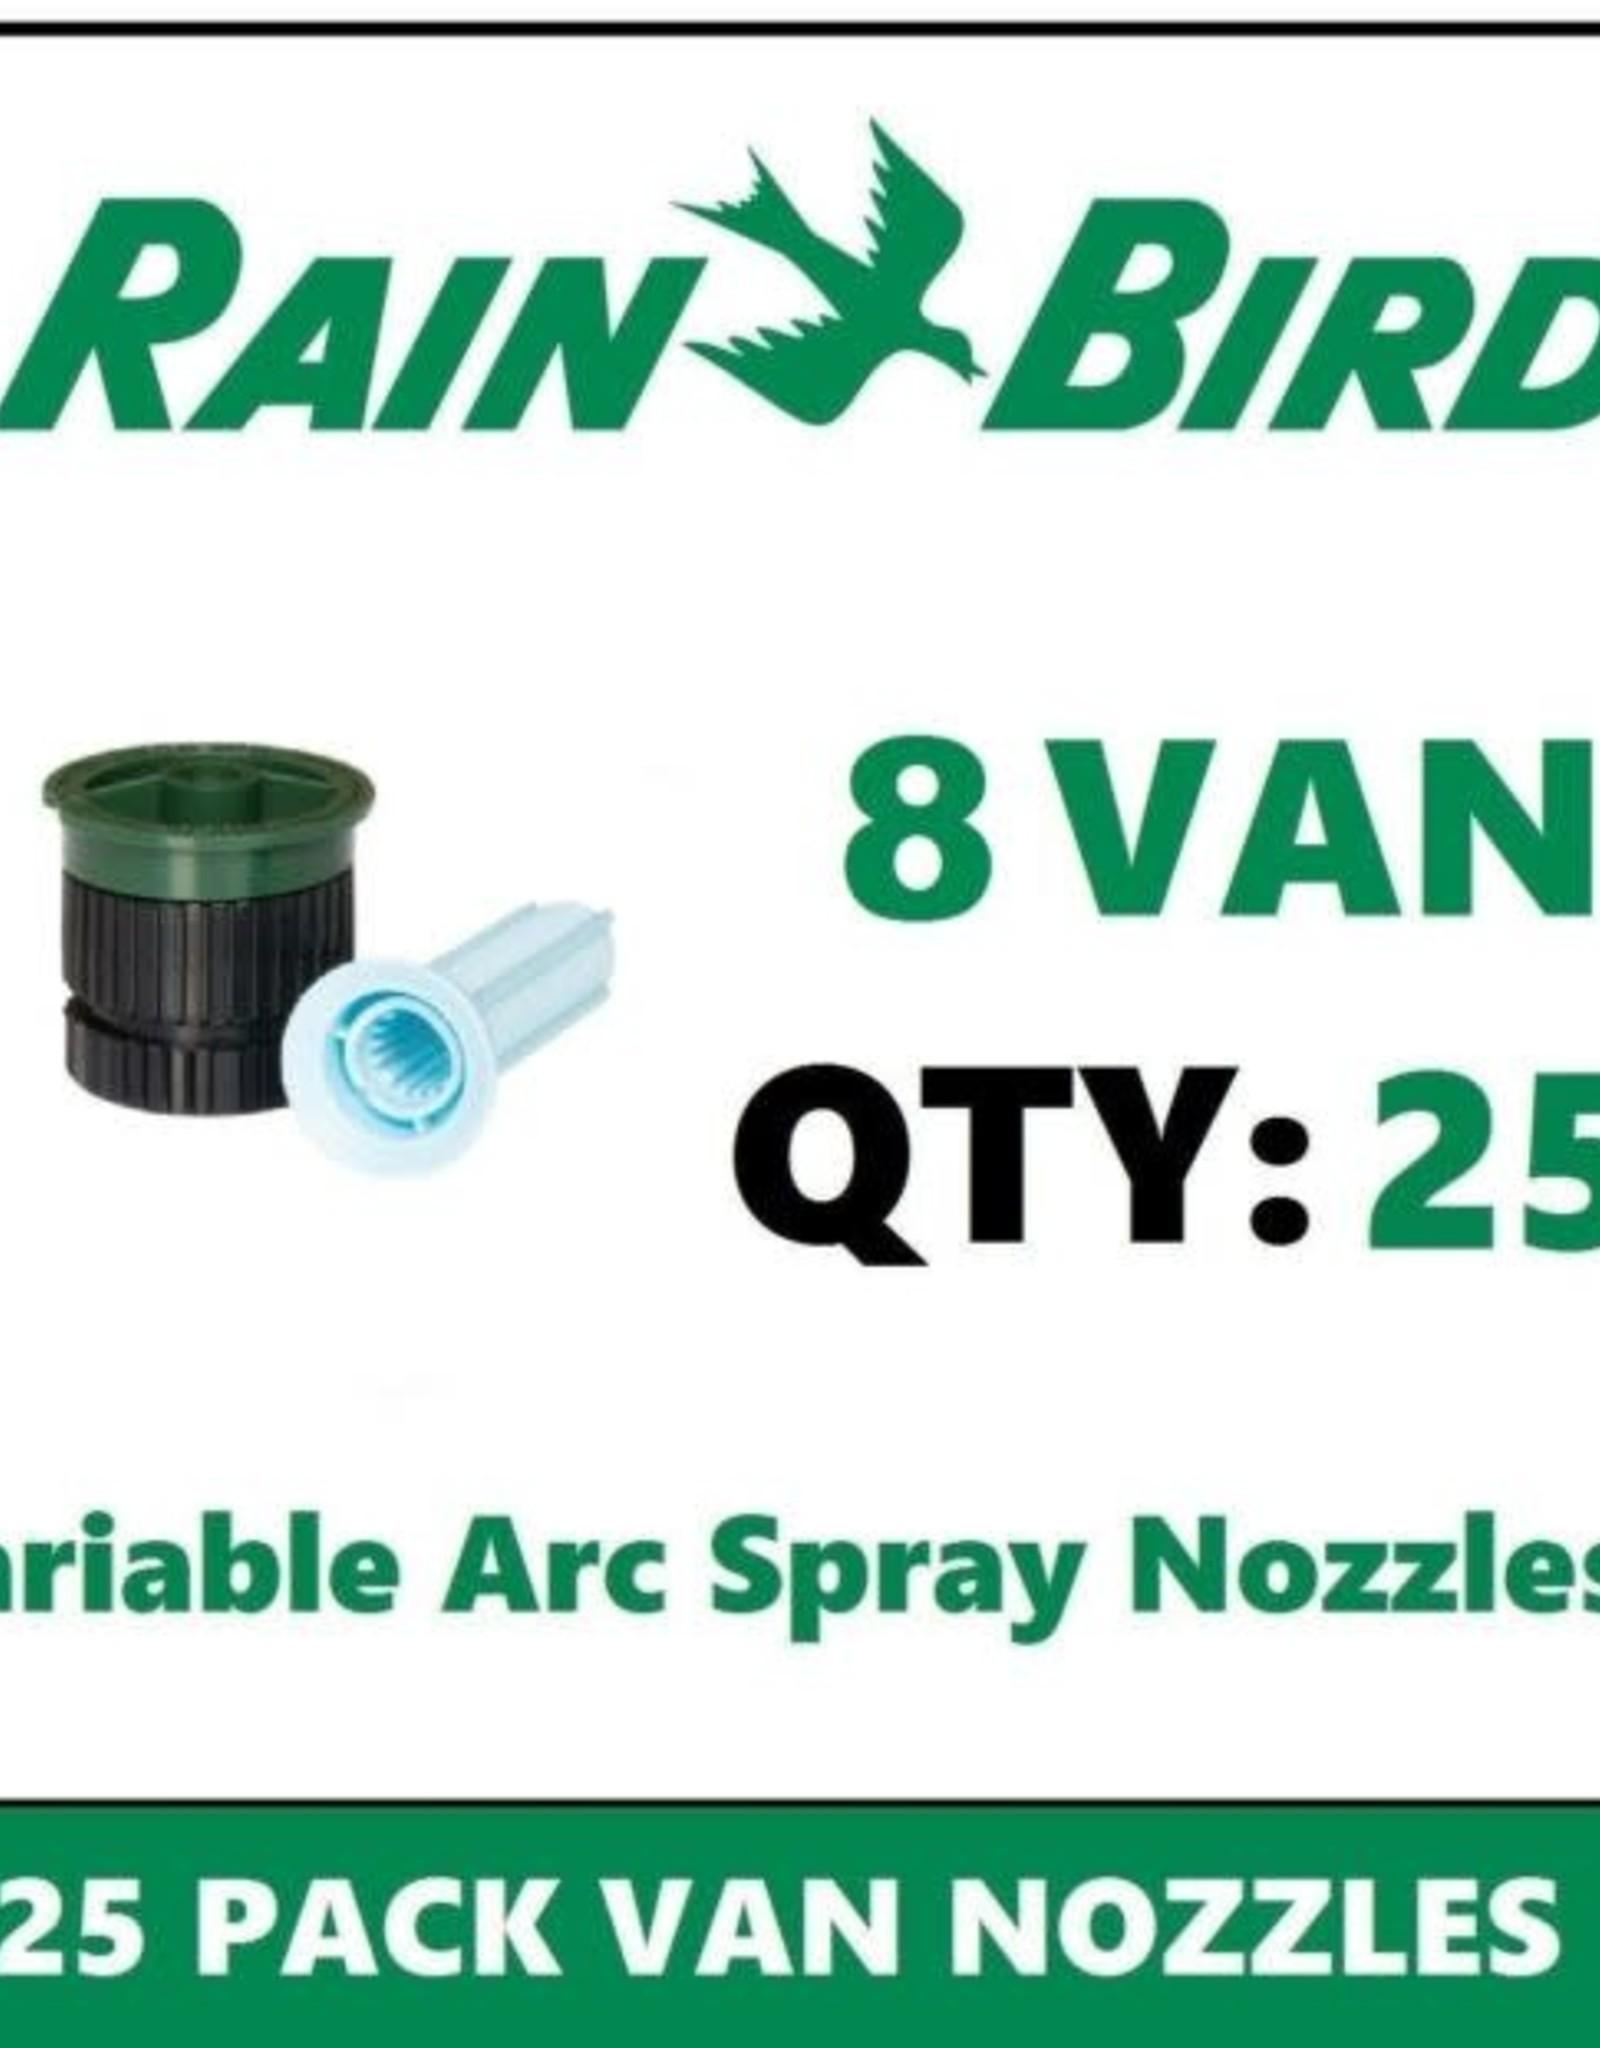 Rain Bird Rain Bird 8VAN Nozzle 8 ft. Radius Variable Arc VAN - 25 Pack